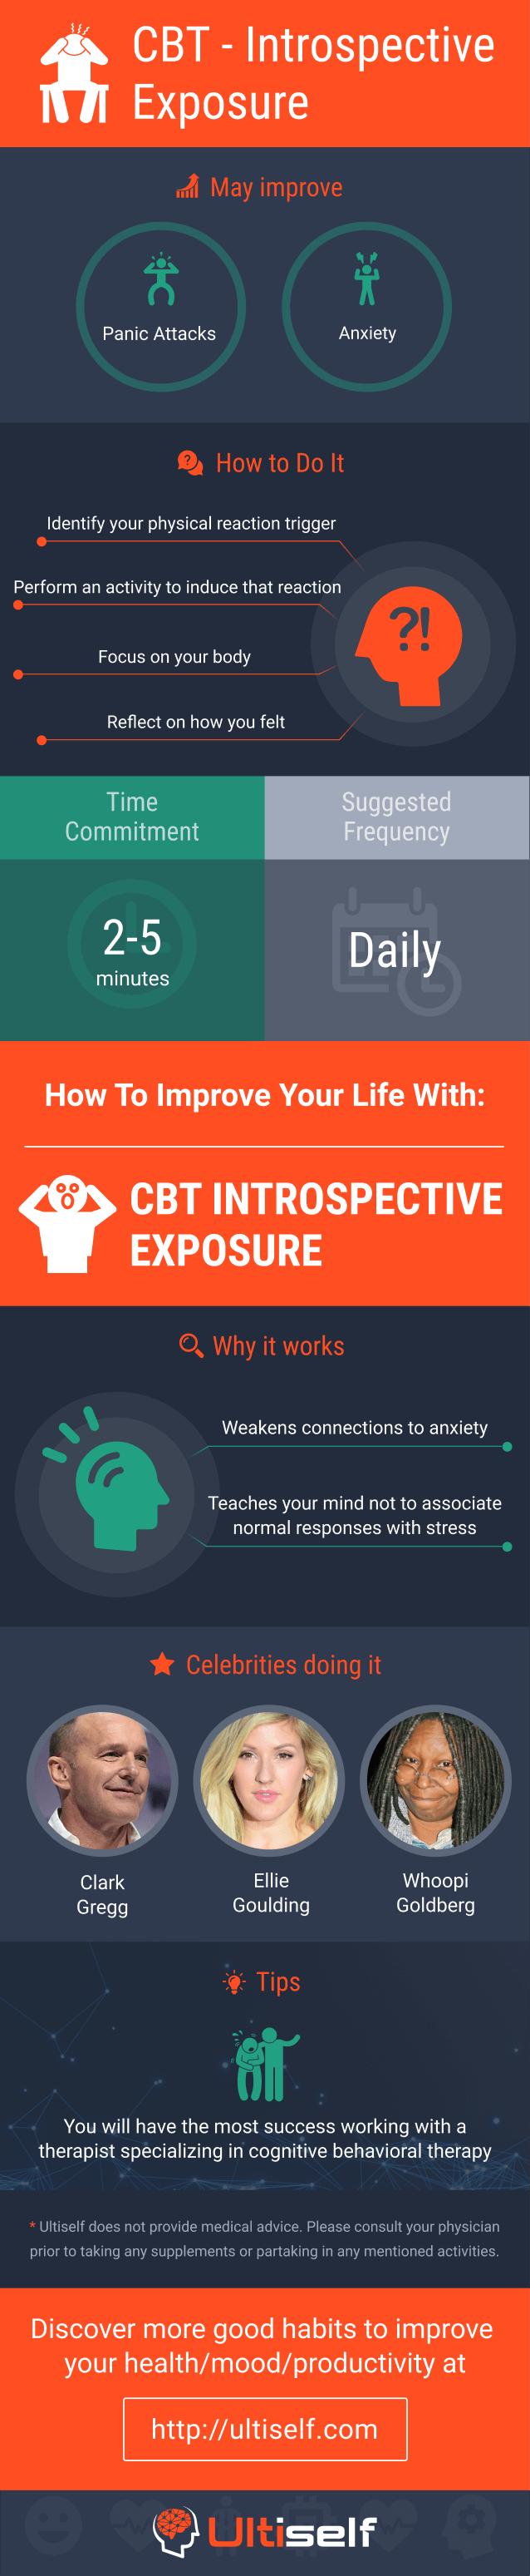 CBT - Introspective Exposure infographic